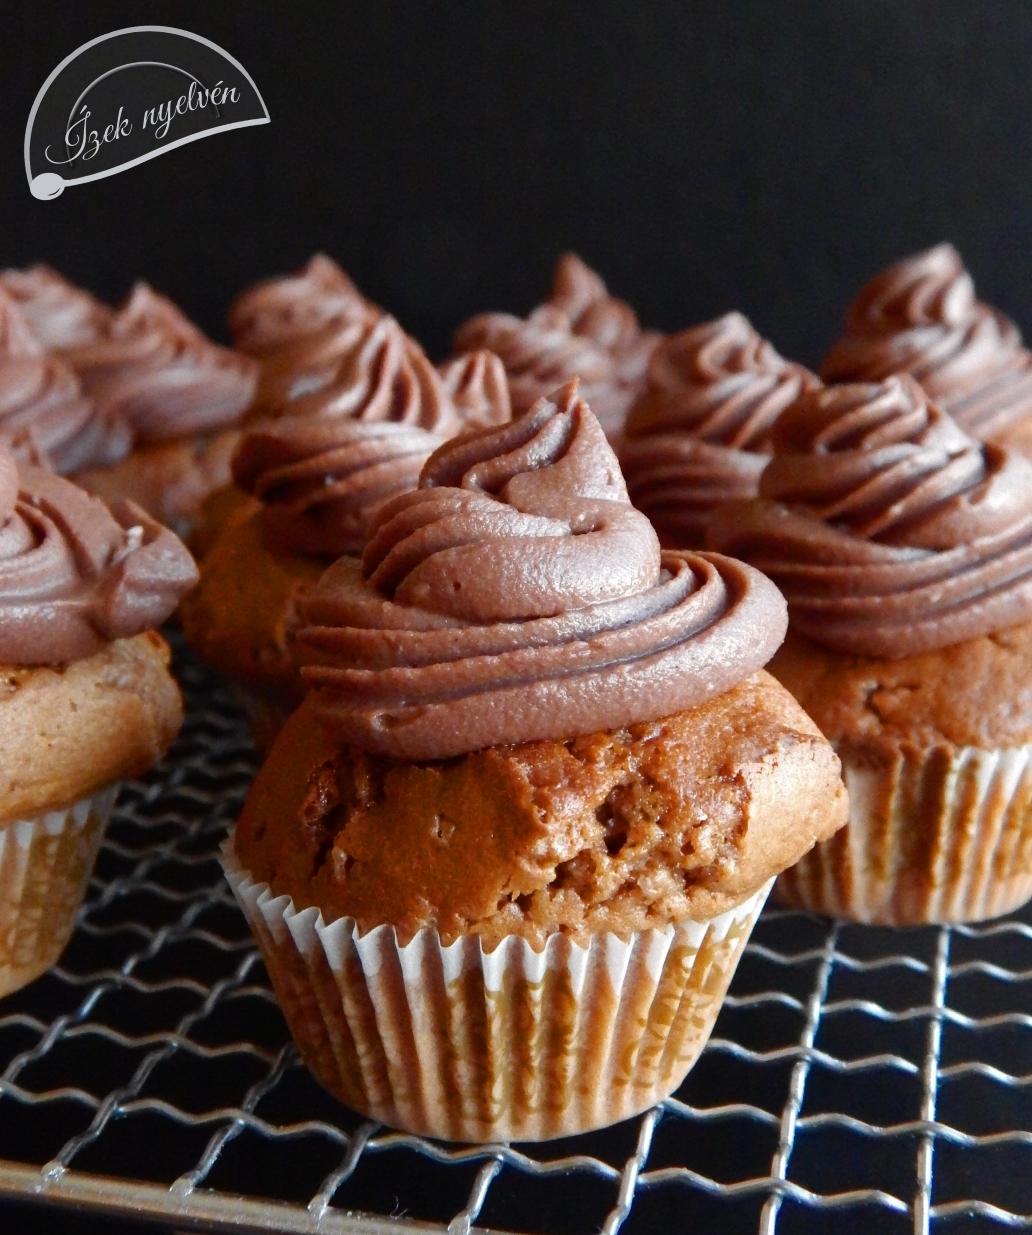 duplacsokis_cupcake2.JPG